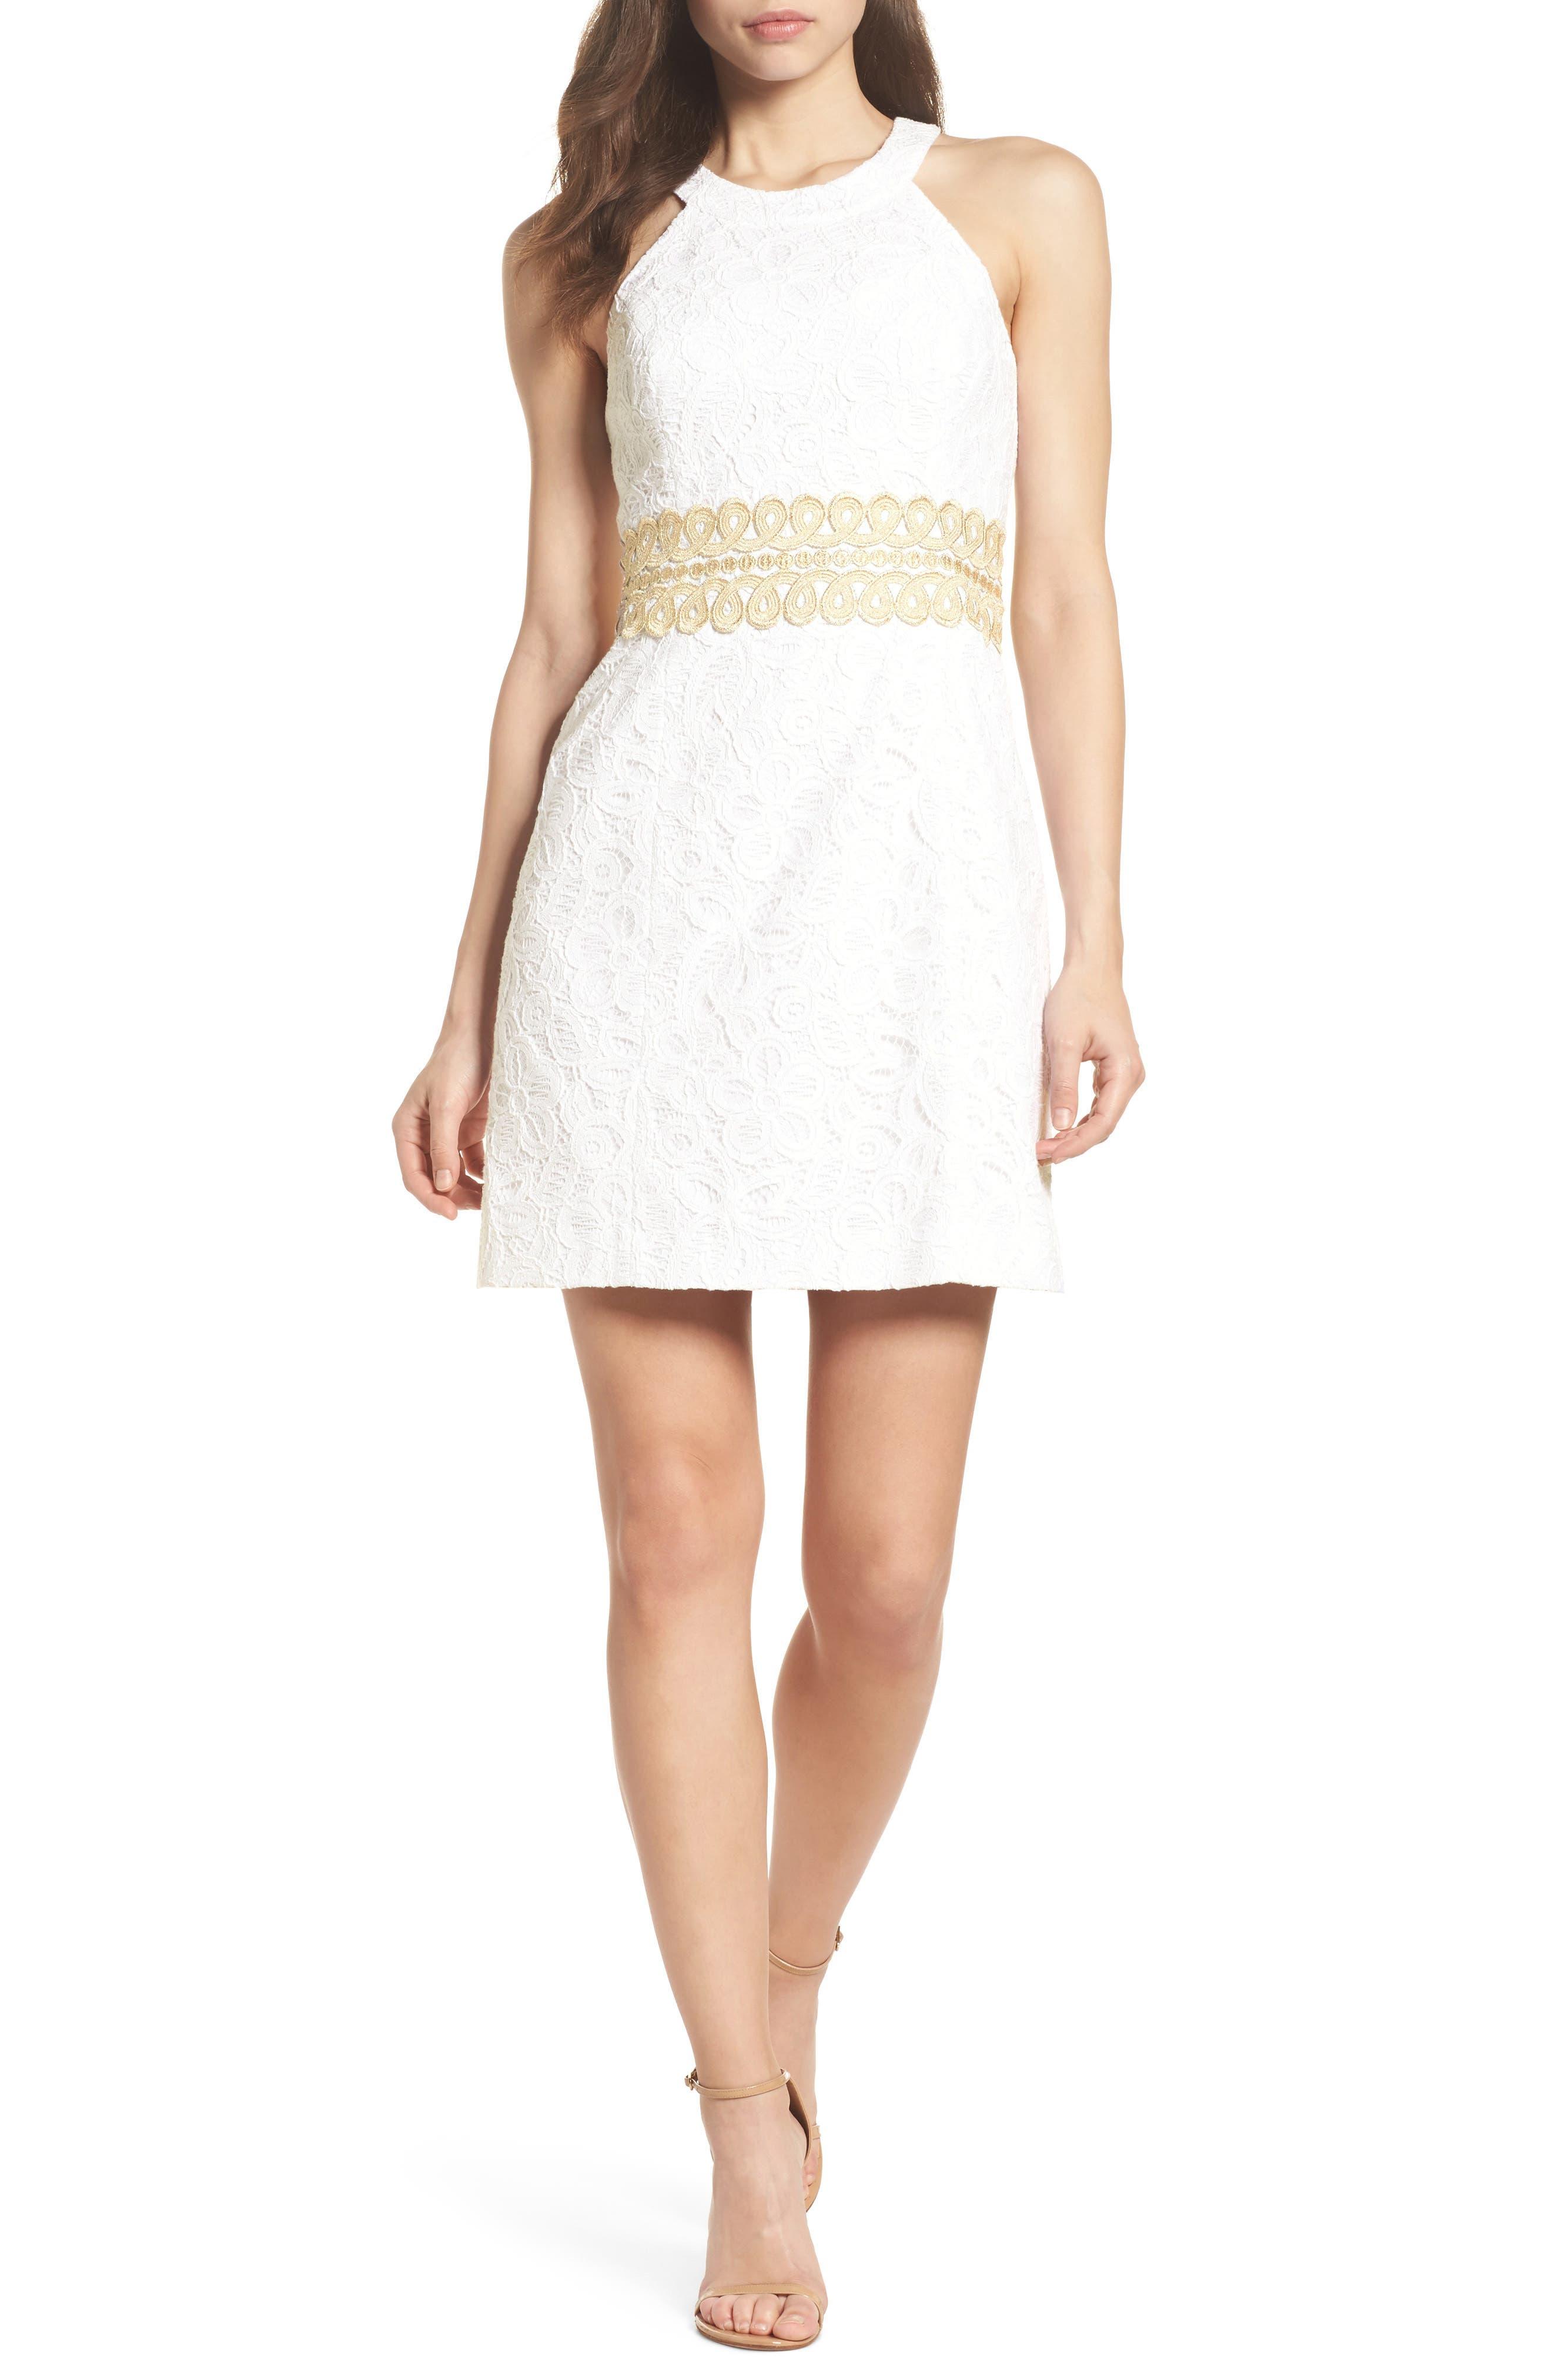 Ashlyn Lace Dress,                             Main thumbnail 1, color,                             Resort White Pop Floral Lace